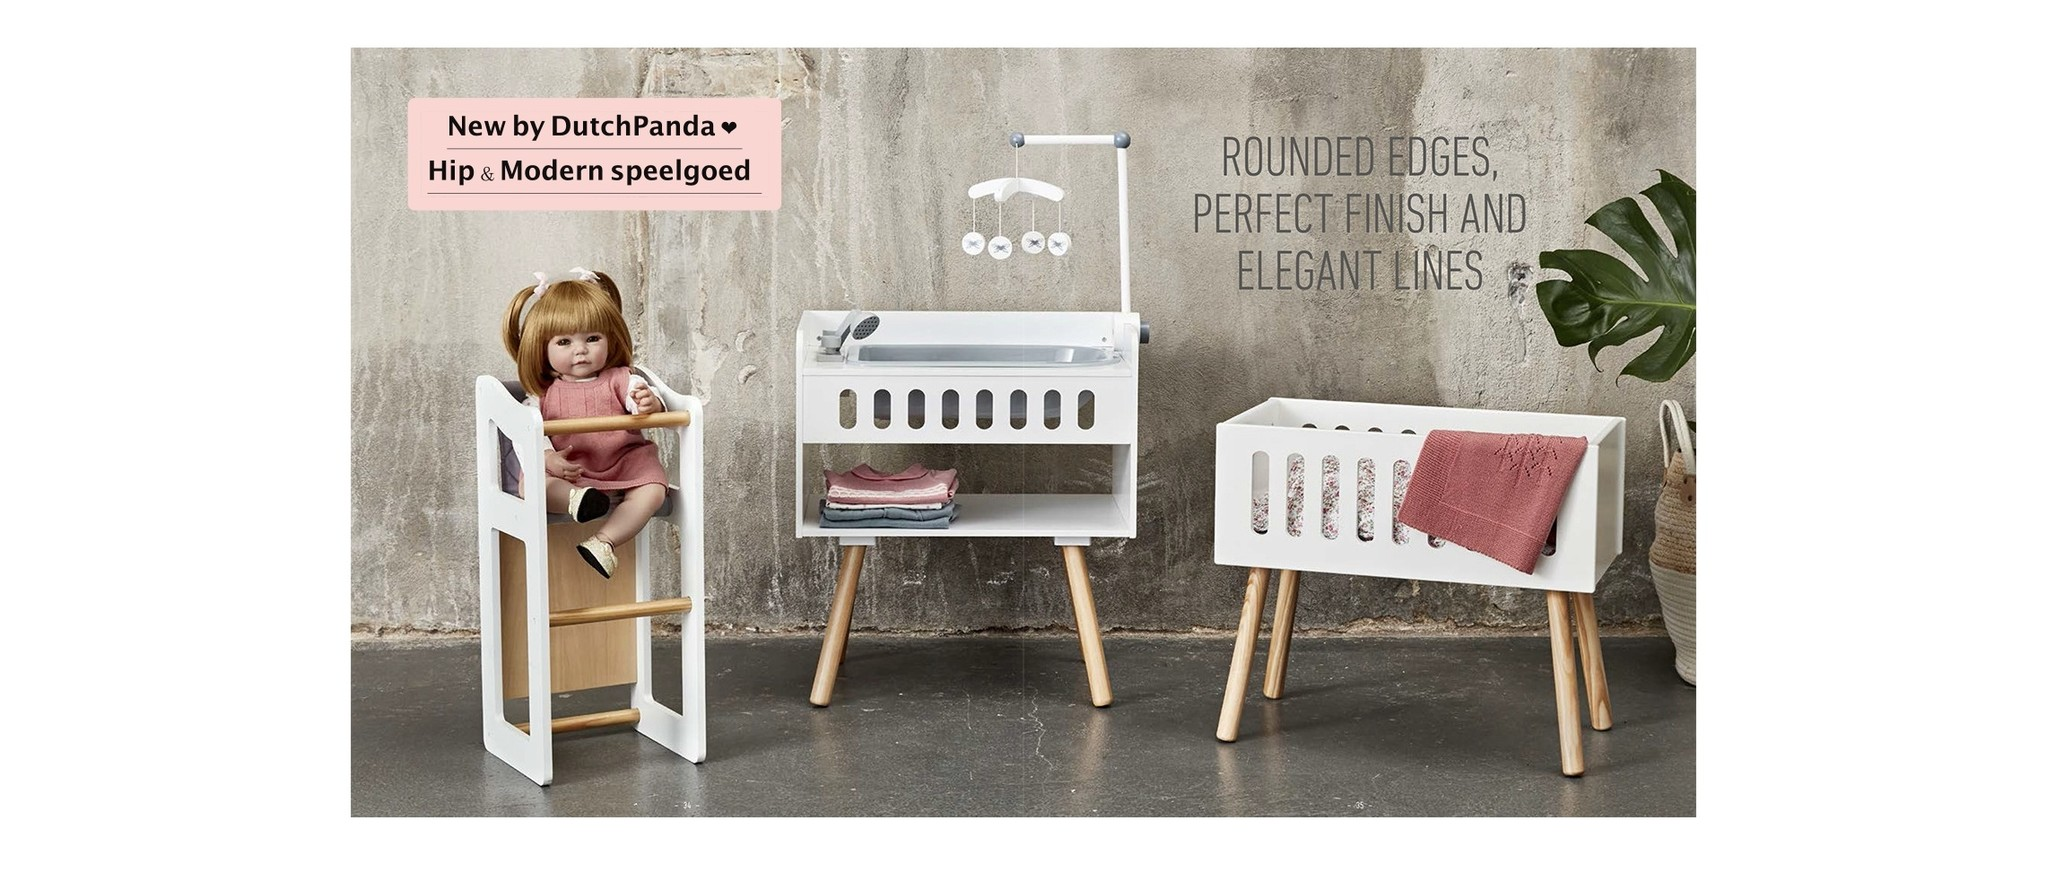 New by DutchPanda ❤︎ Hip & Modern speelgoed van het merk ByAbstrup